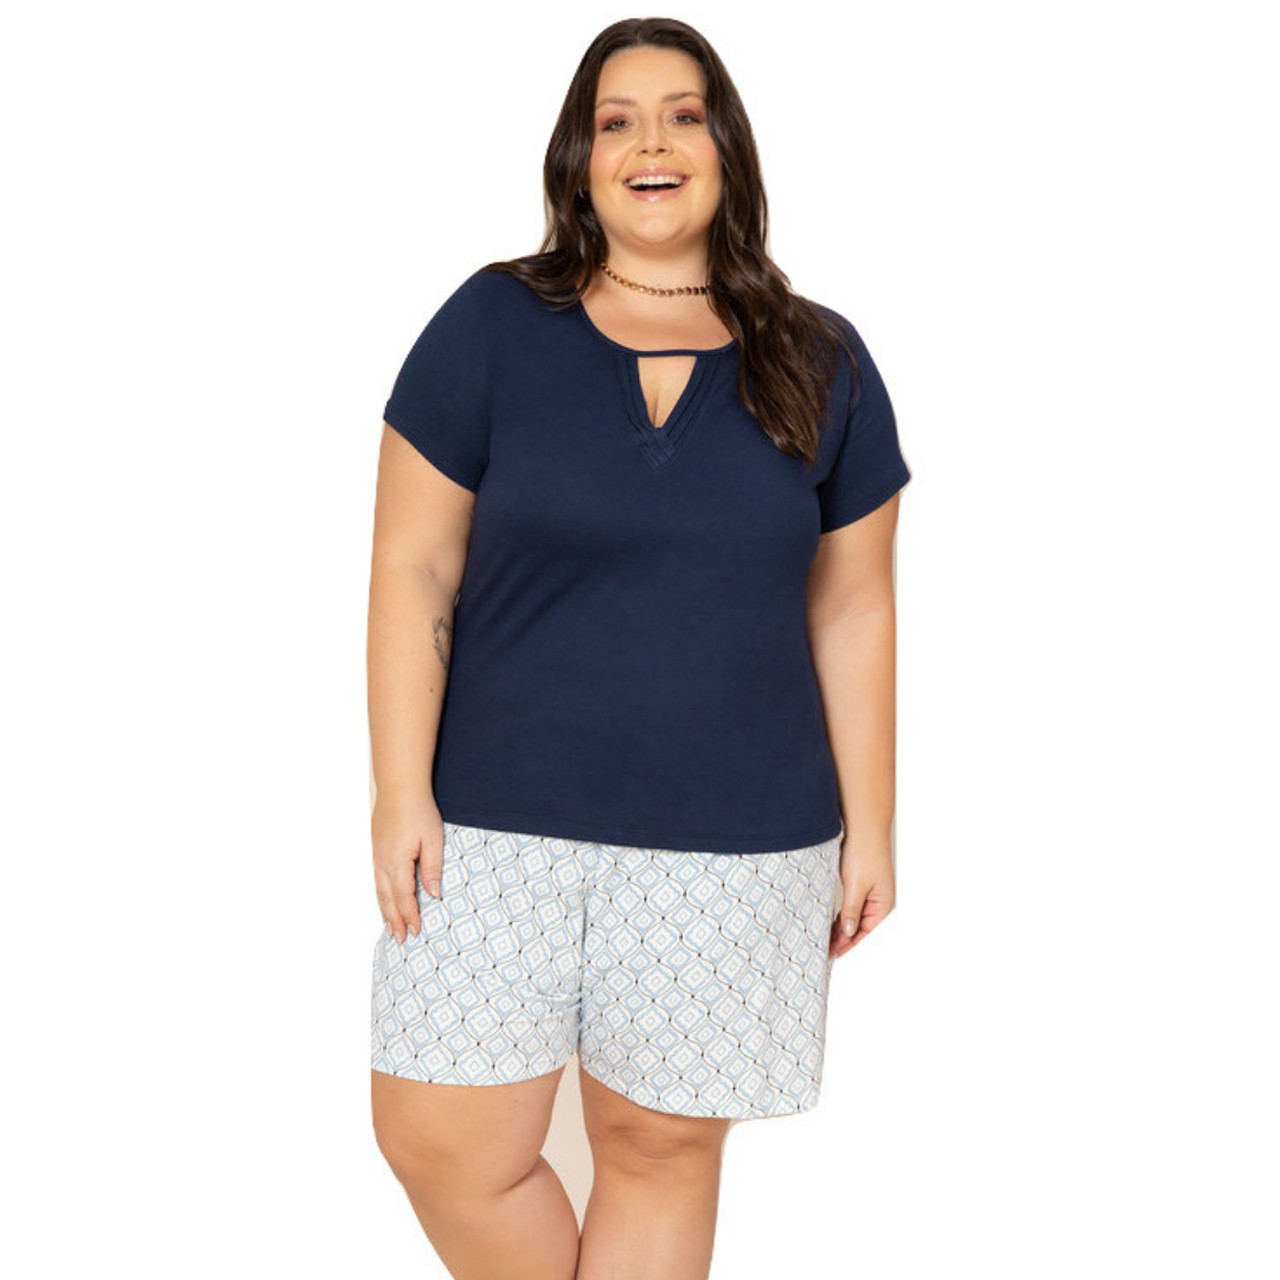 Pijama plus size verão blusa com manga bermuda feminina